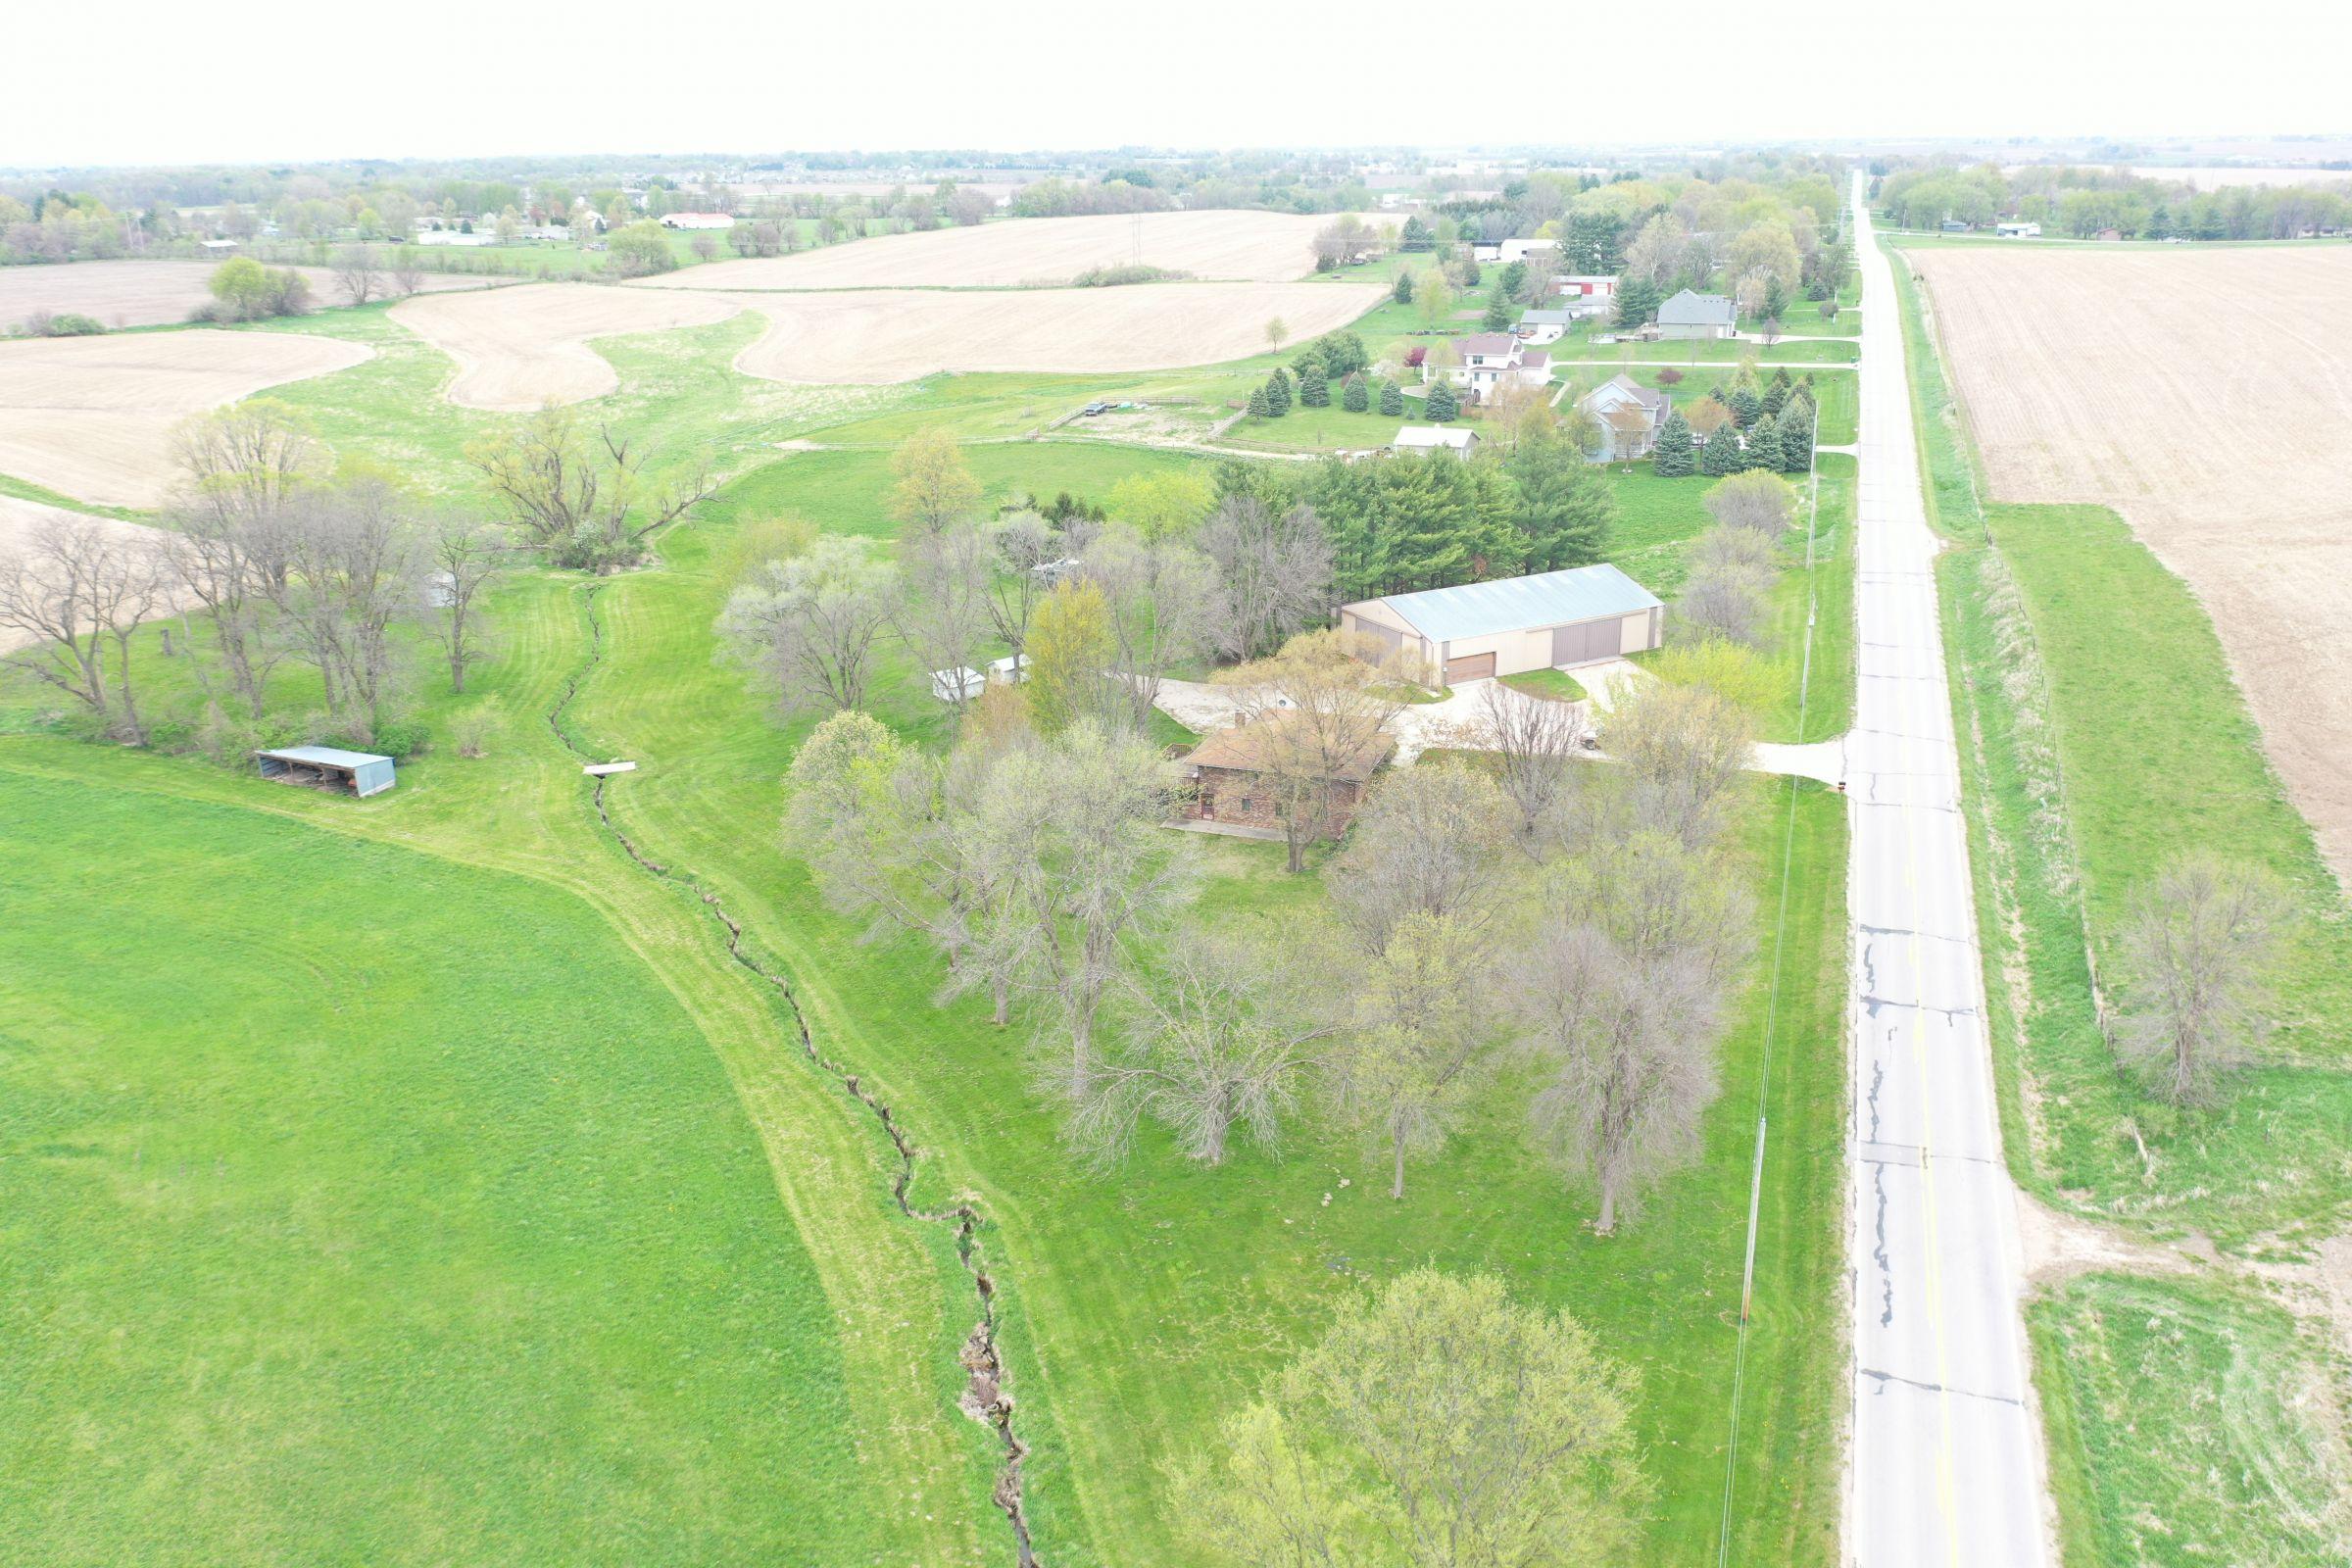 residential-polk-county-iowa-34-acres-listing-number-15502-2-2021-04-29-143231.JPG